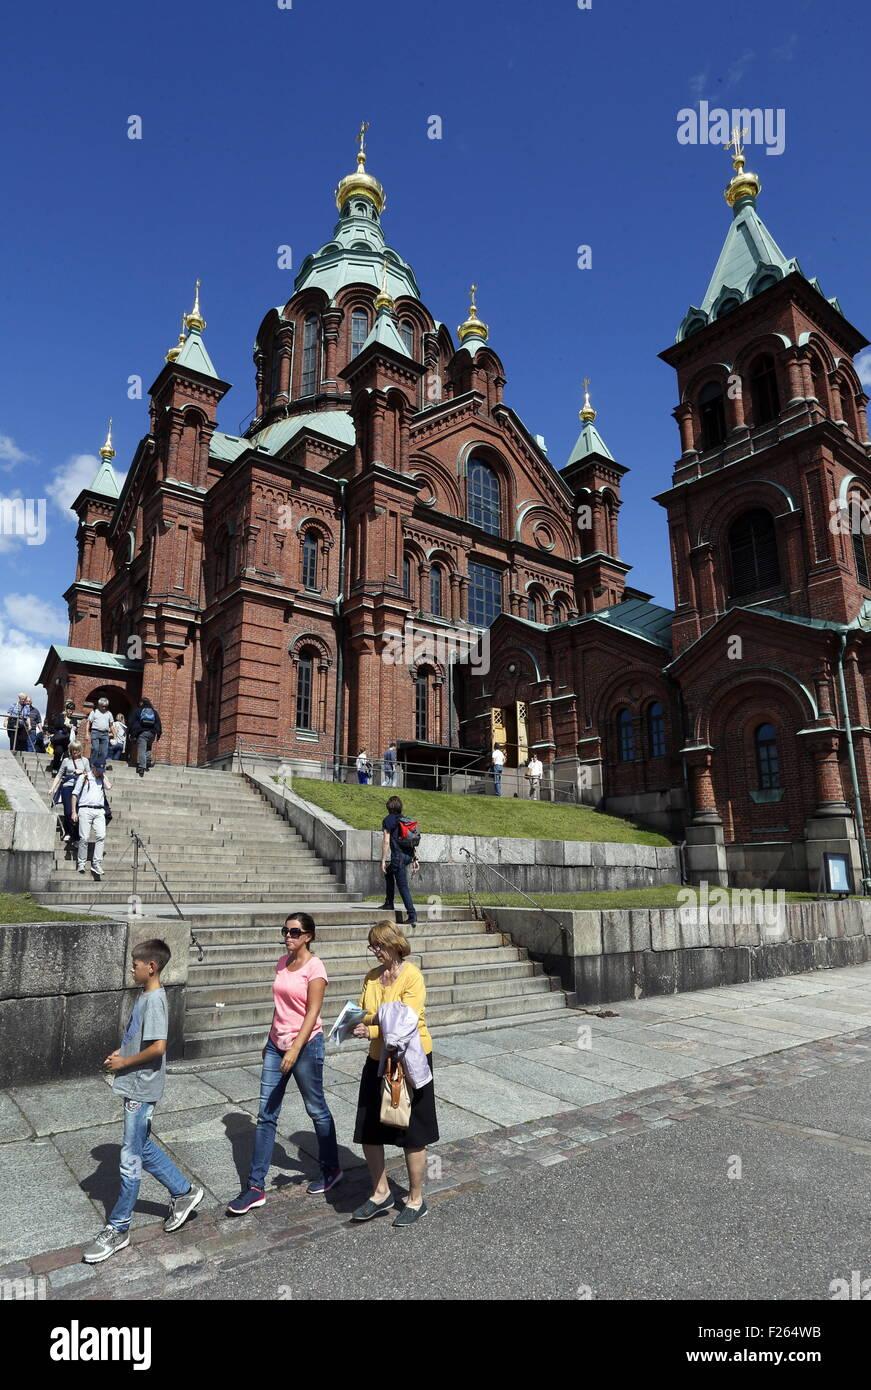 Helsinki, Finland. 1st Aug, 2015. A view of the Uspenski [Dormition] Cathedral. © Valery Matytsin/TASS/Alamy - Stock Image